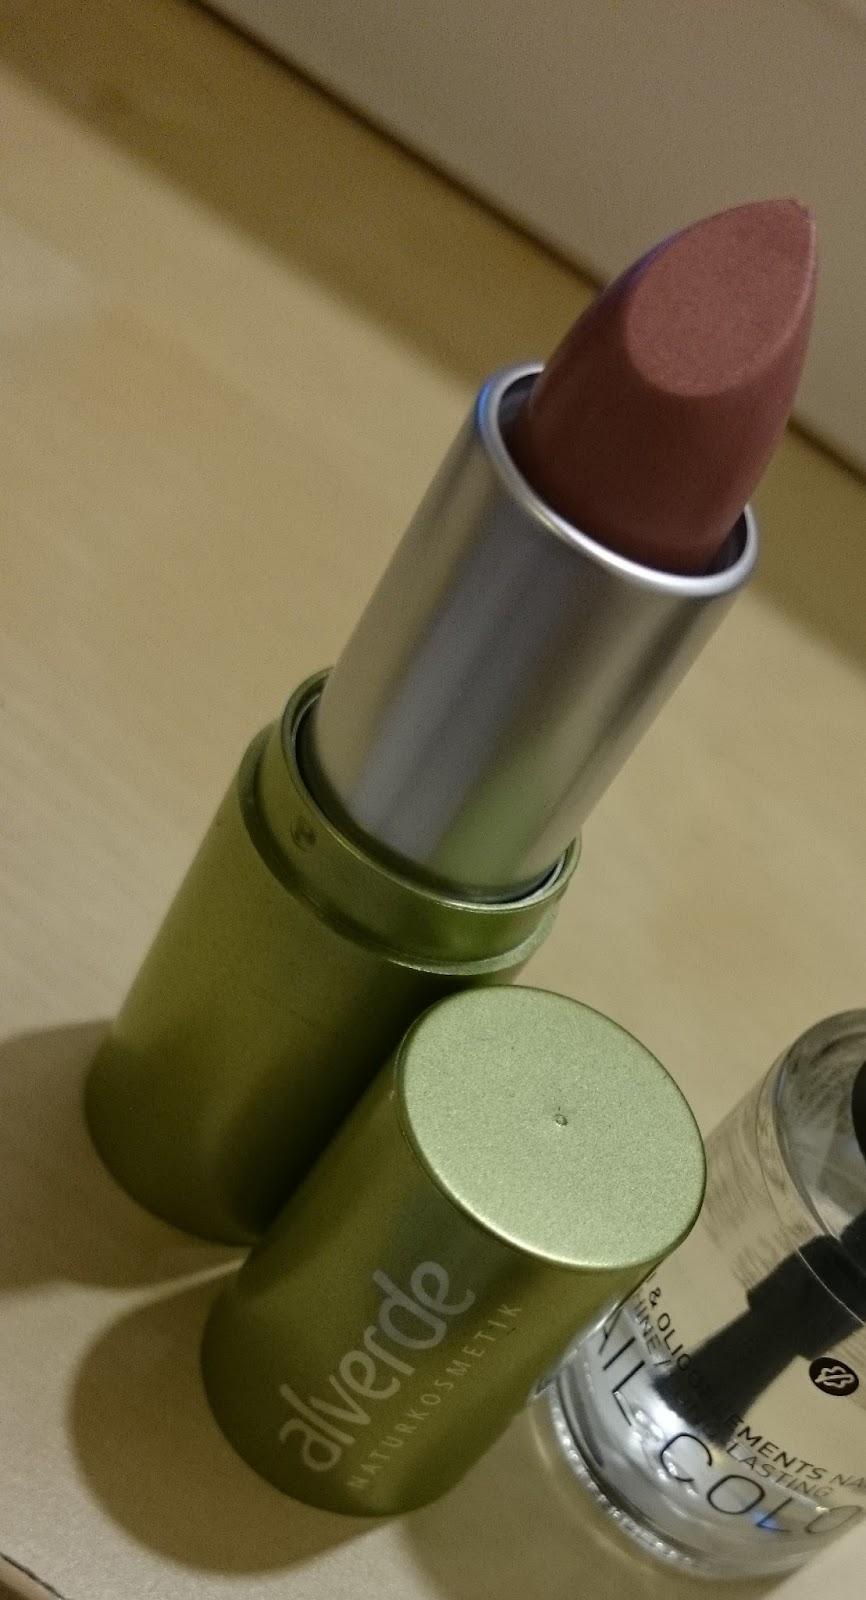 alverde Lippenstift 02 Shiny Terra